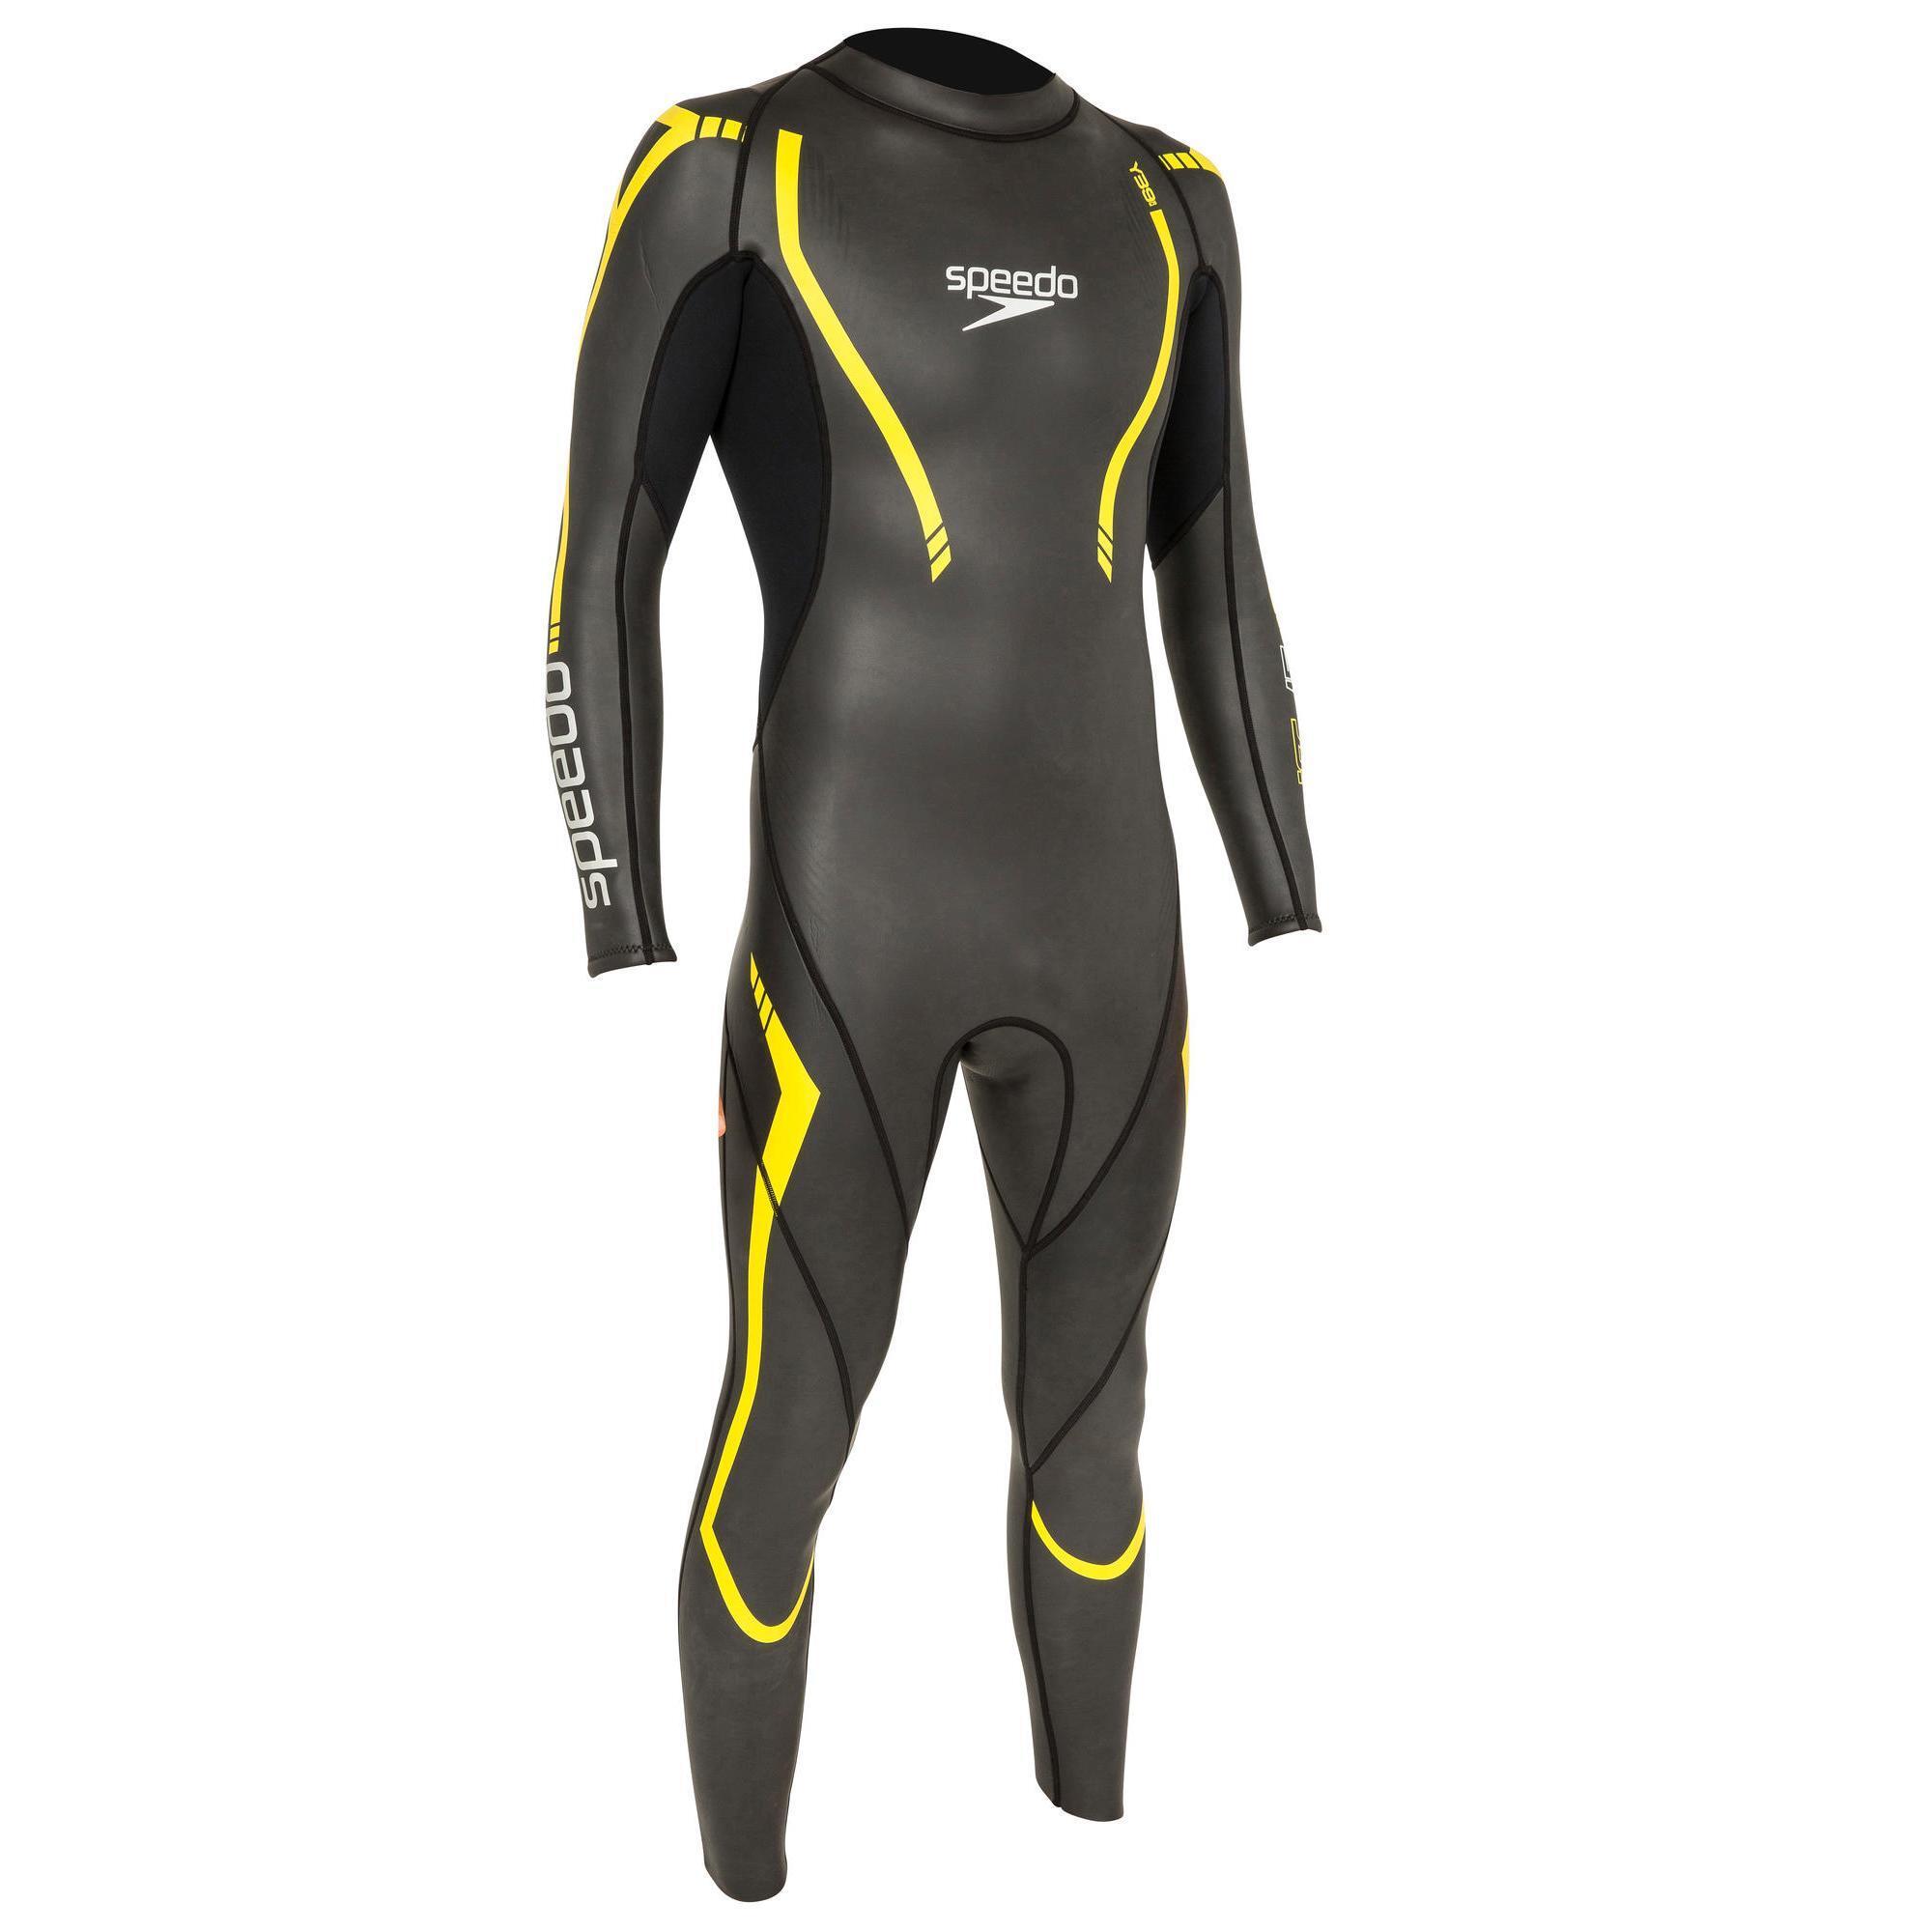 Speedo Wetsuit Thinswim Speedo 2.0 blauw/geel